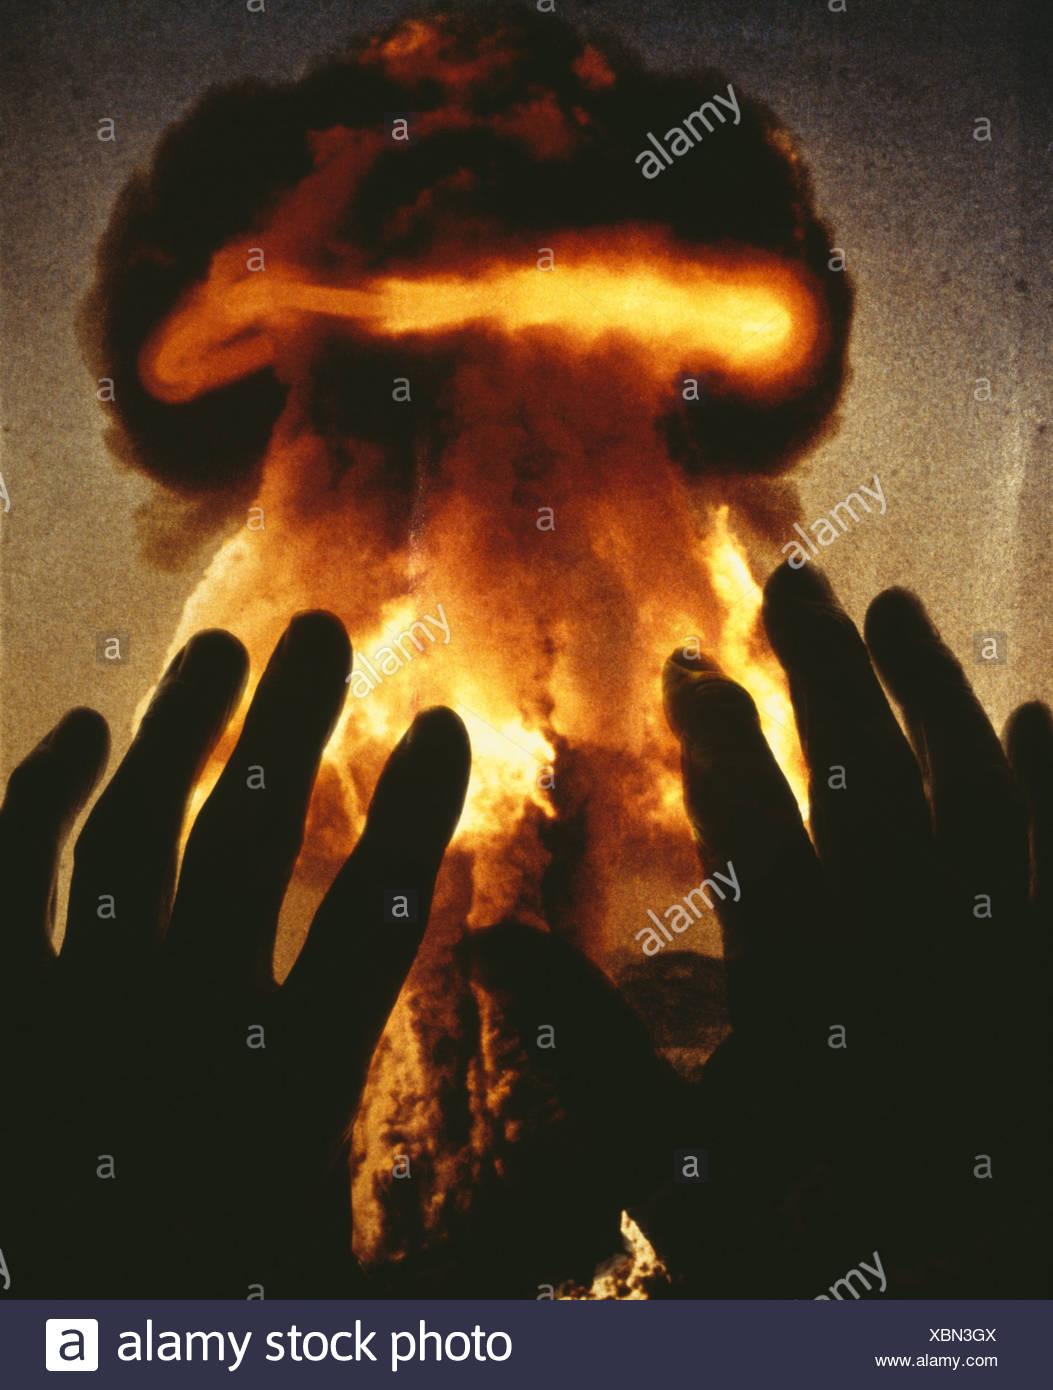 Atom bomb explosion - Stock Image